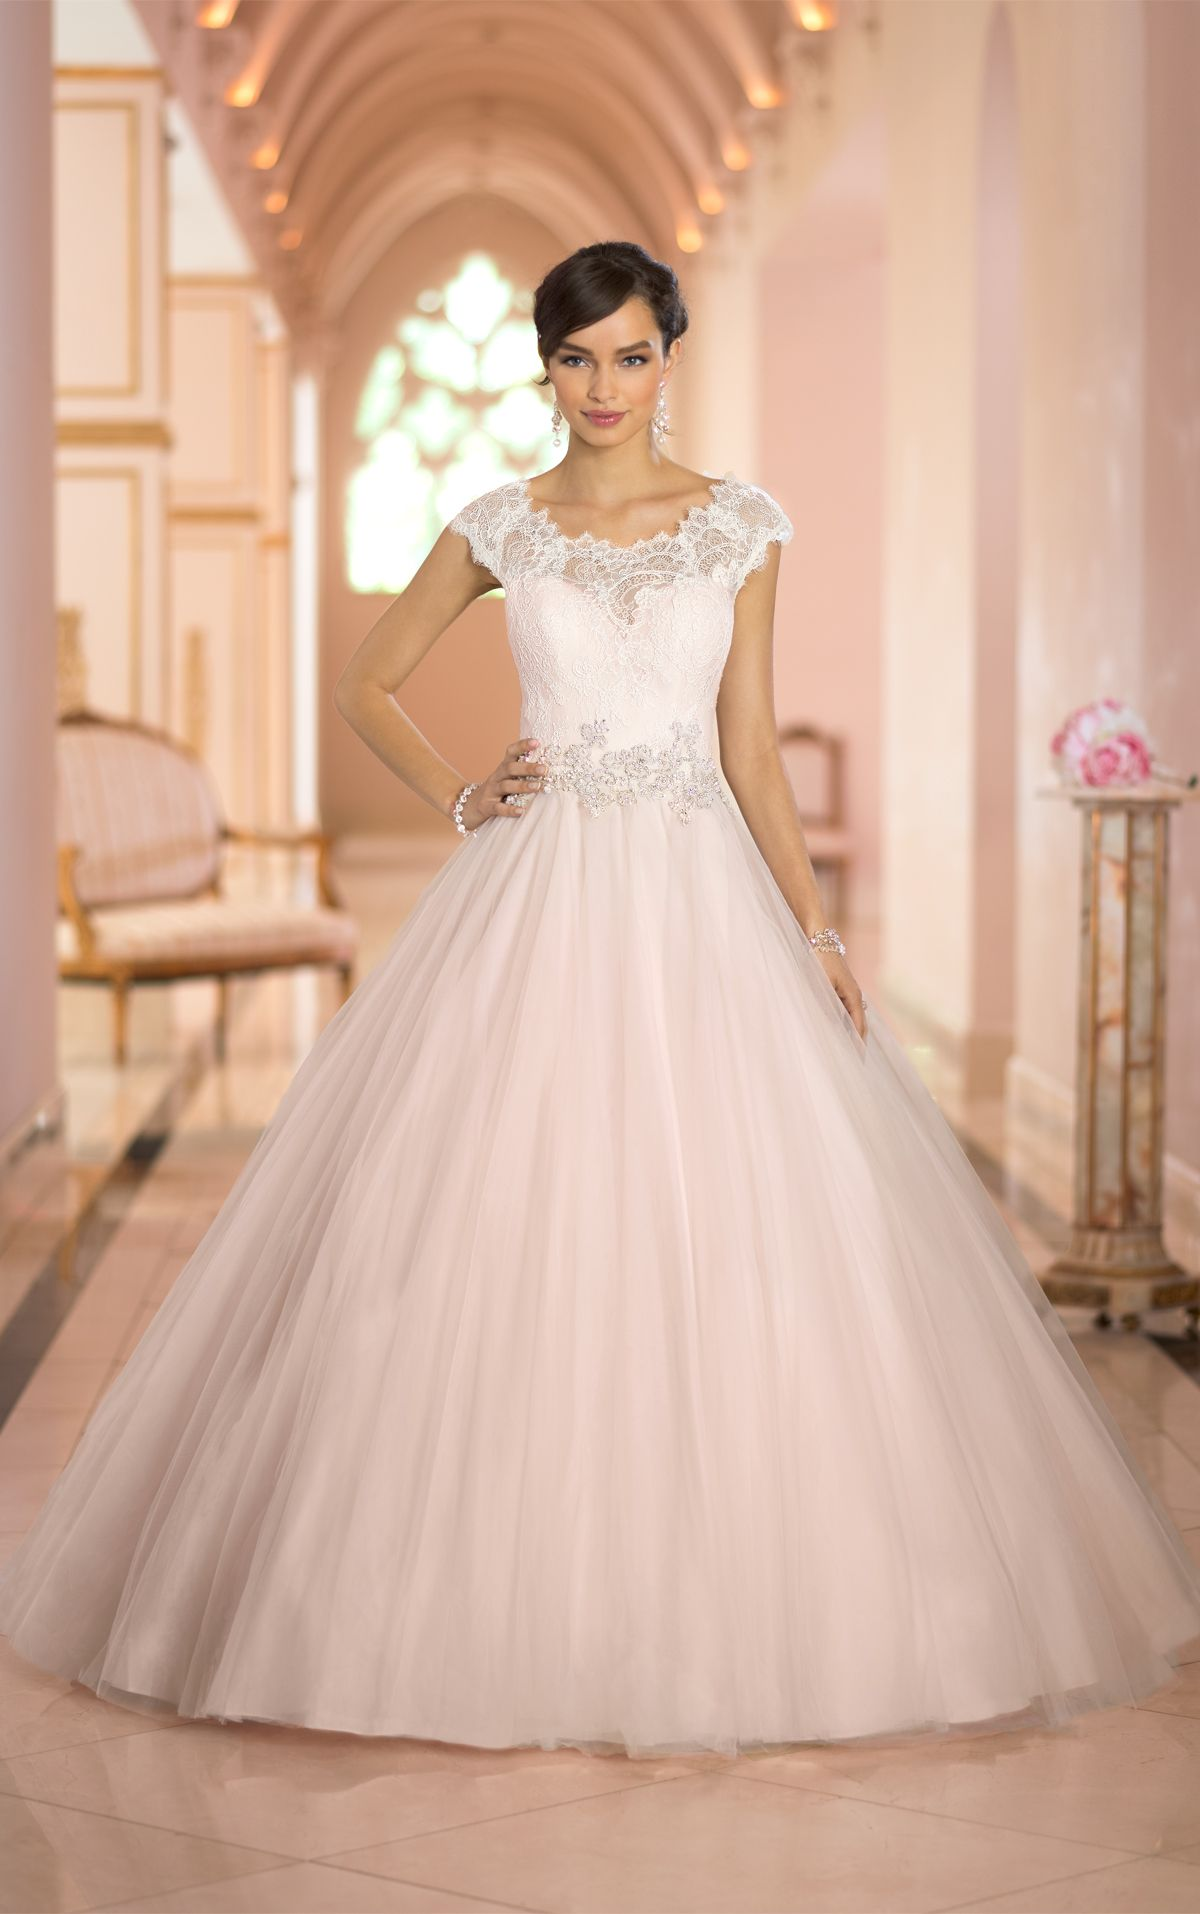 Sexy and Extravagant Stella York Wedding Dresses 2014 | Stella york ...